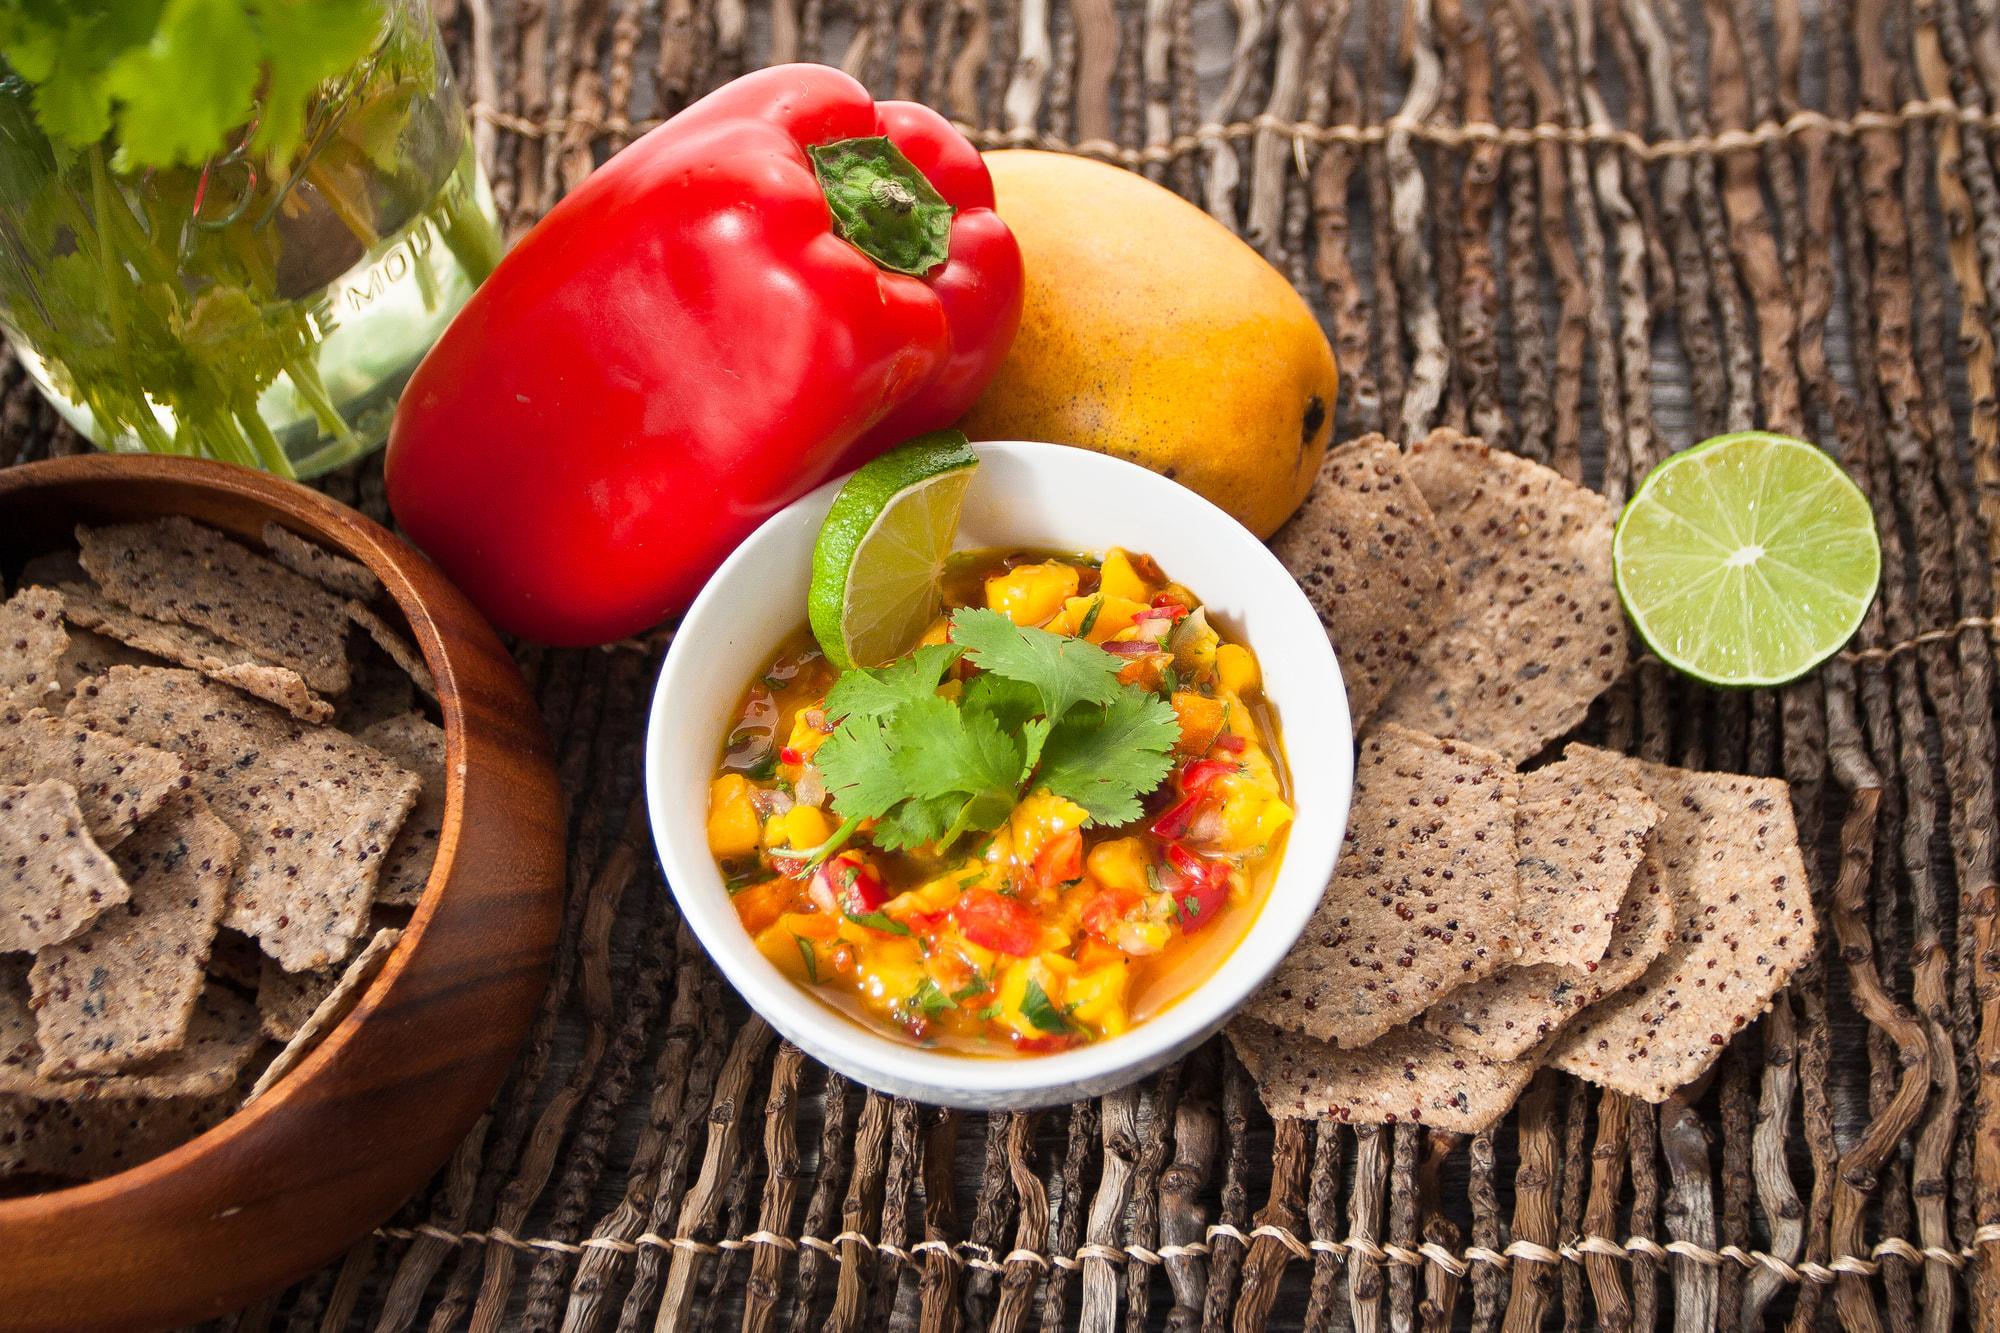 margaritas kitchen__soulstice mind body spa_vegan catering.jpg